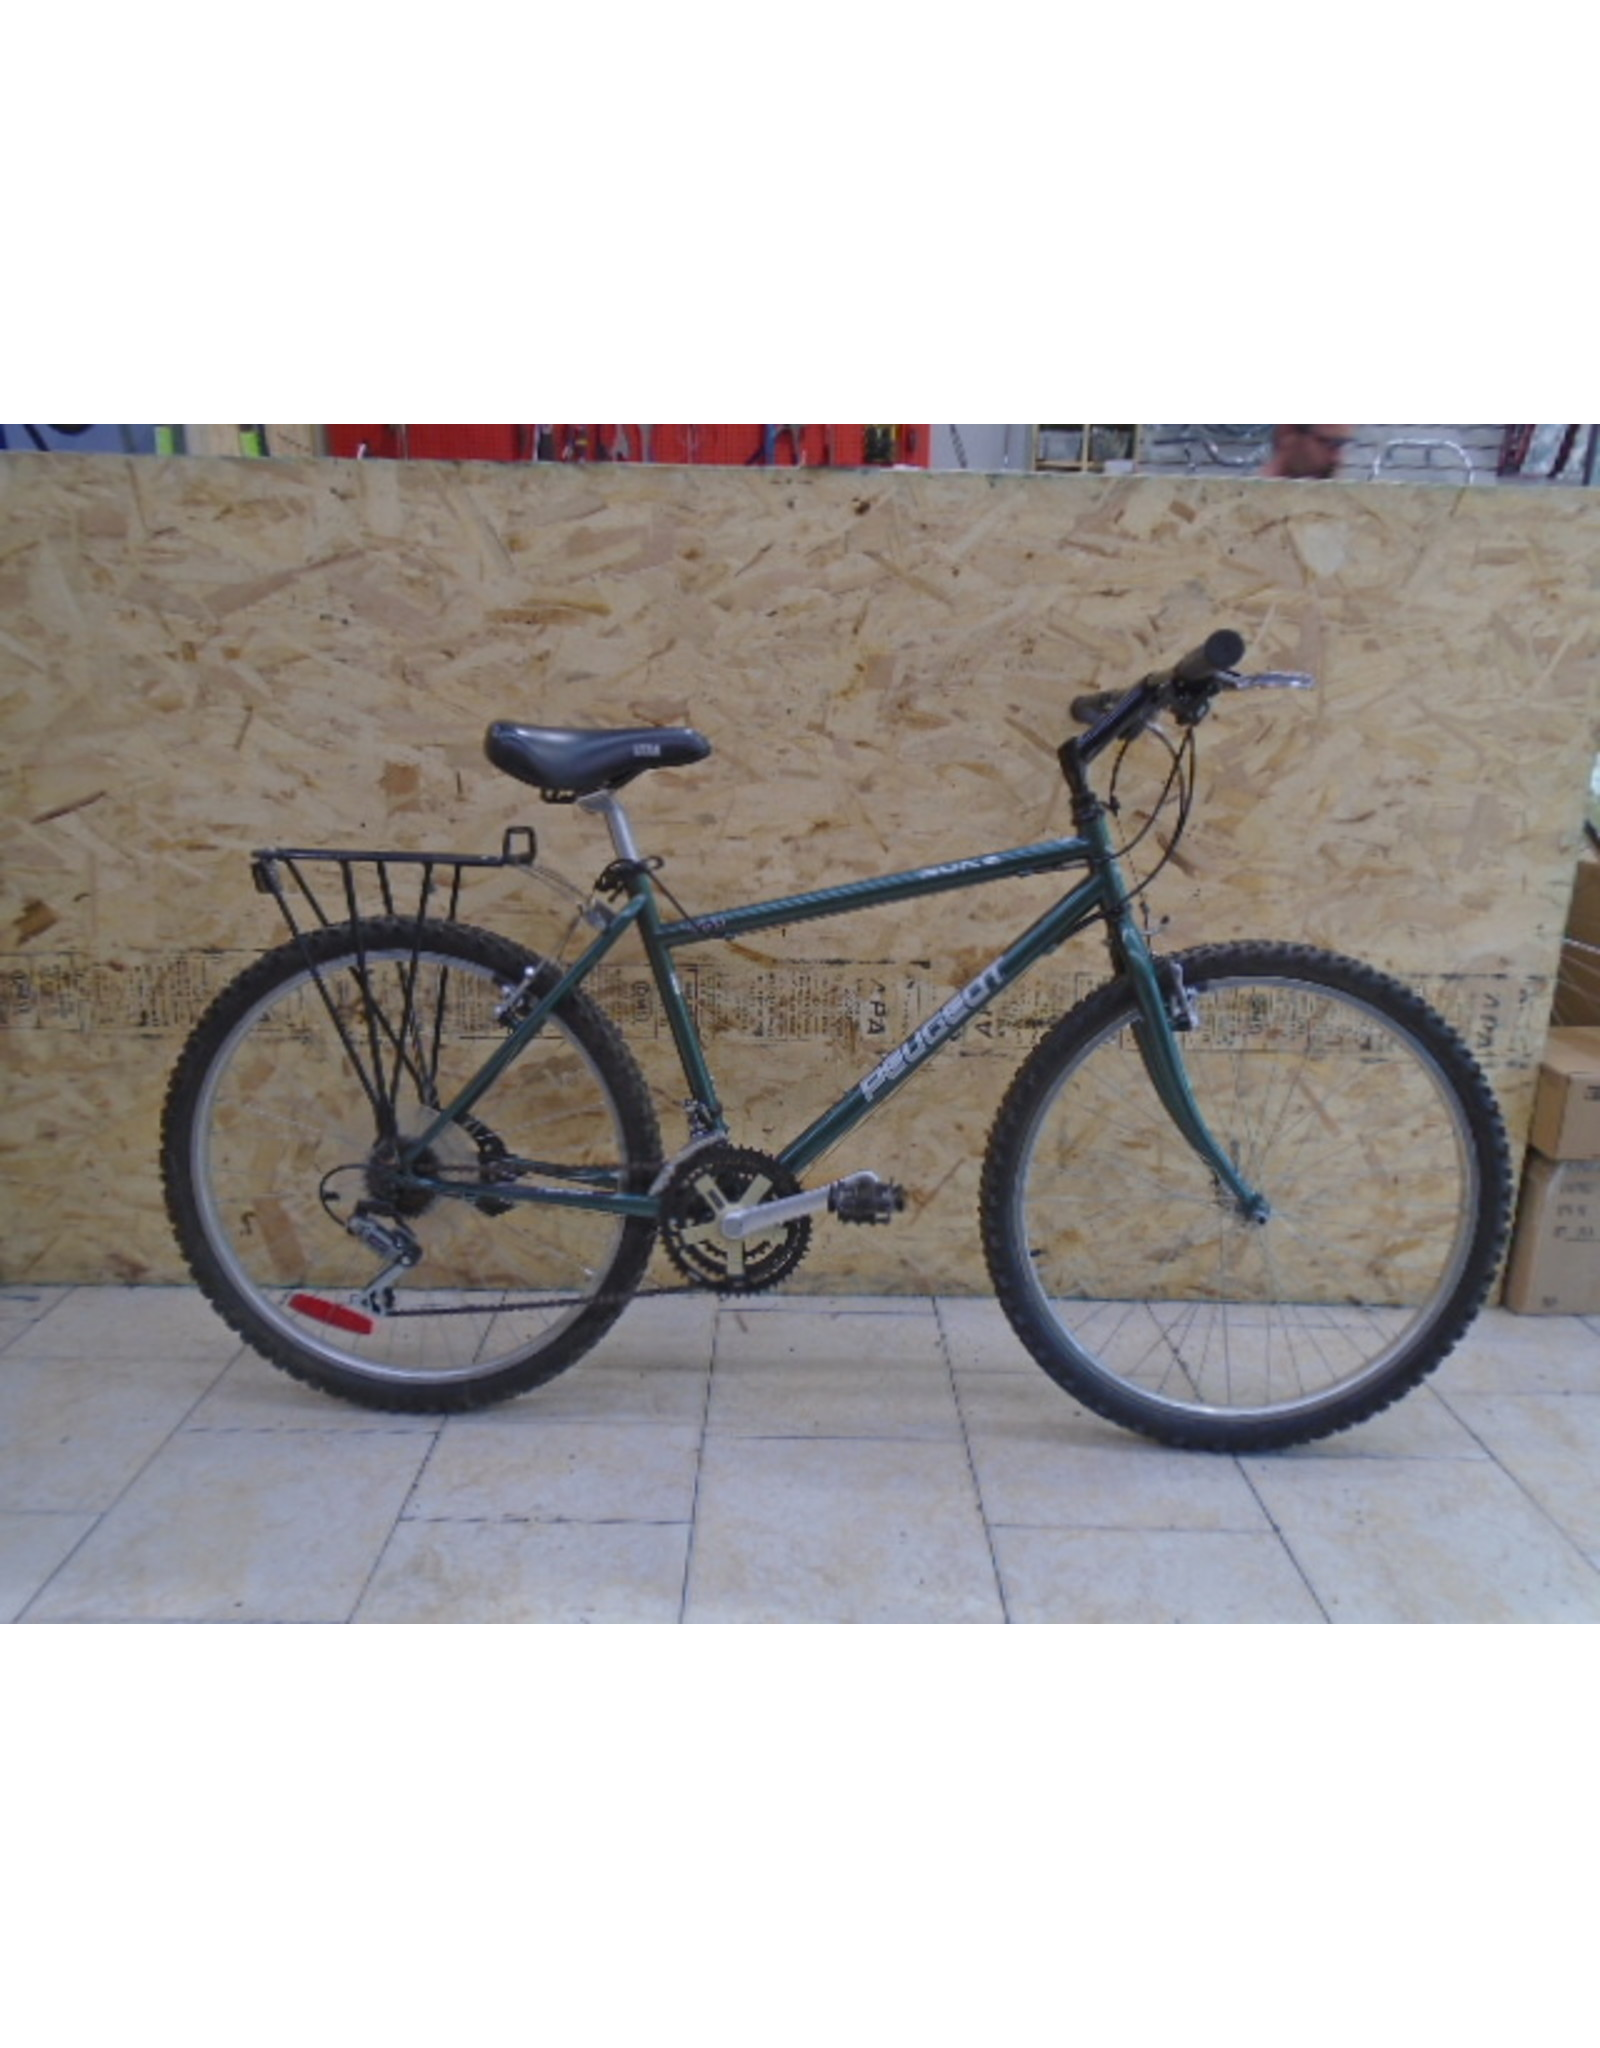 Peugeot 18 '' used mountain bike - 9975